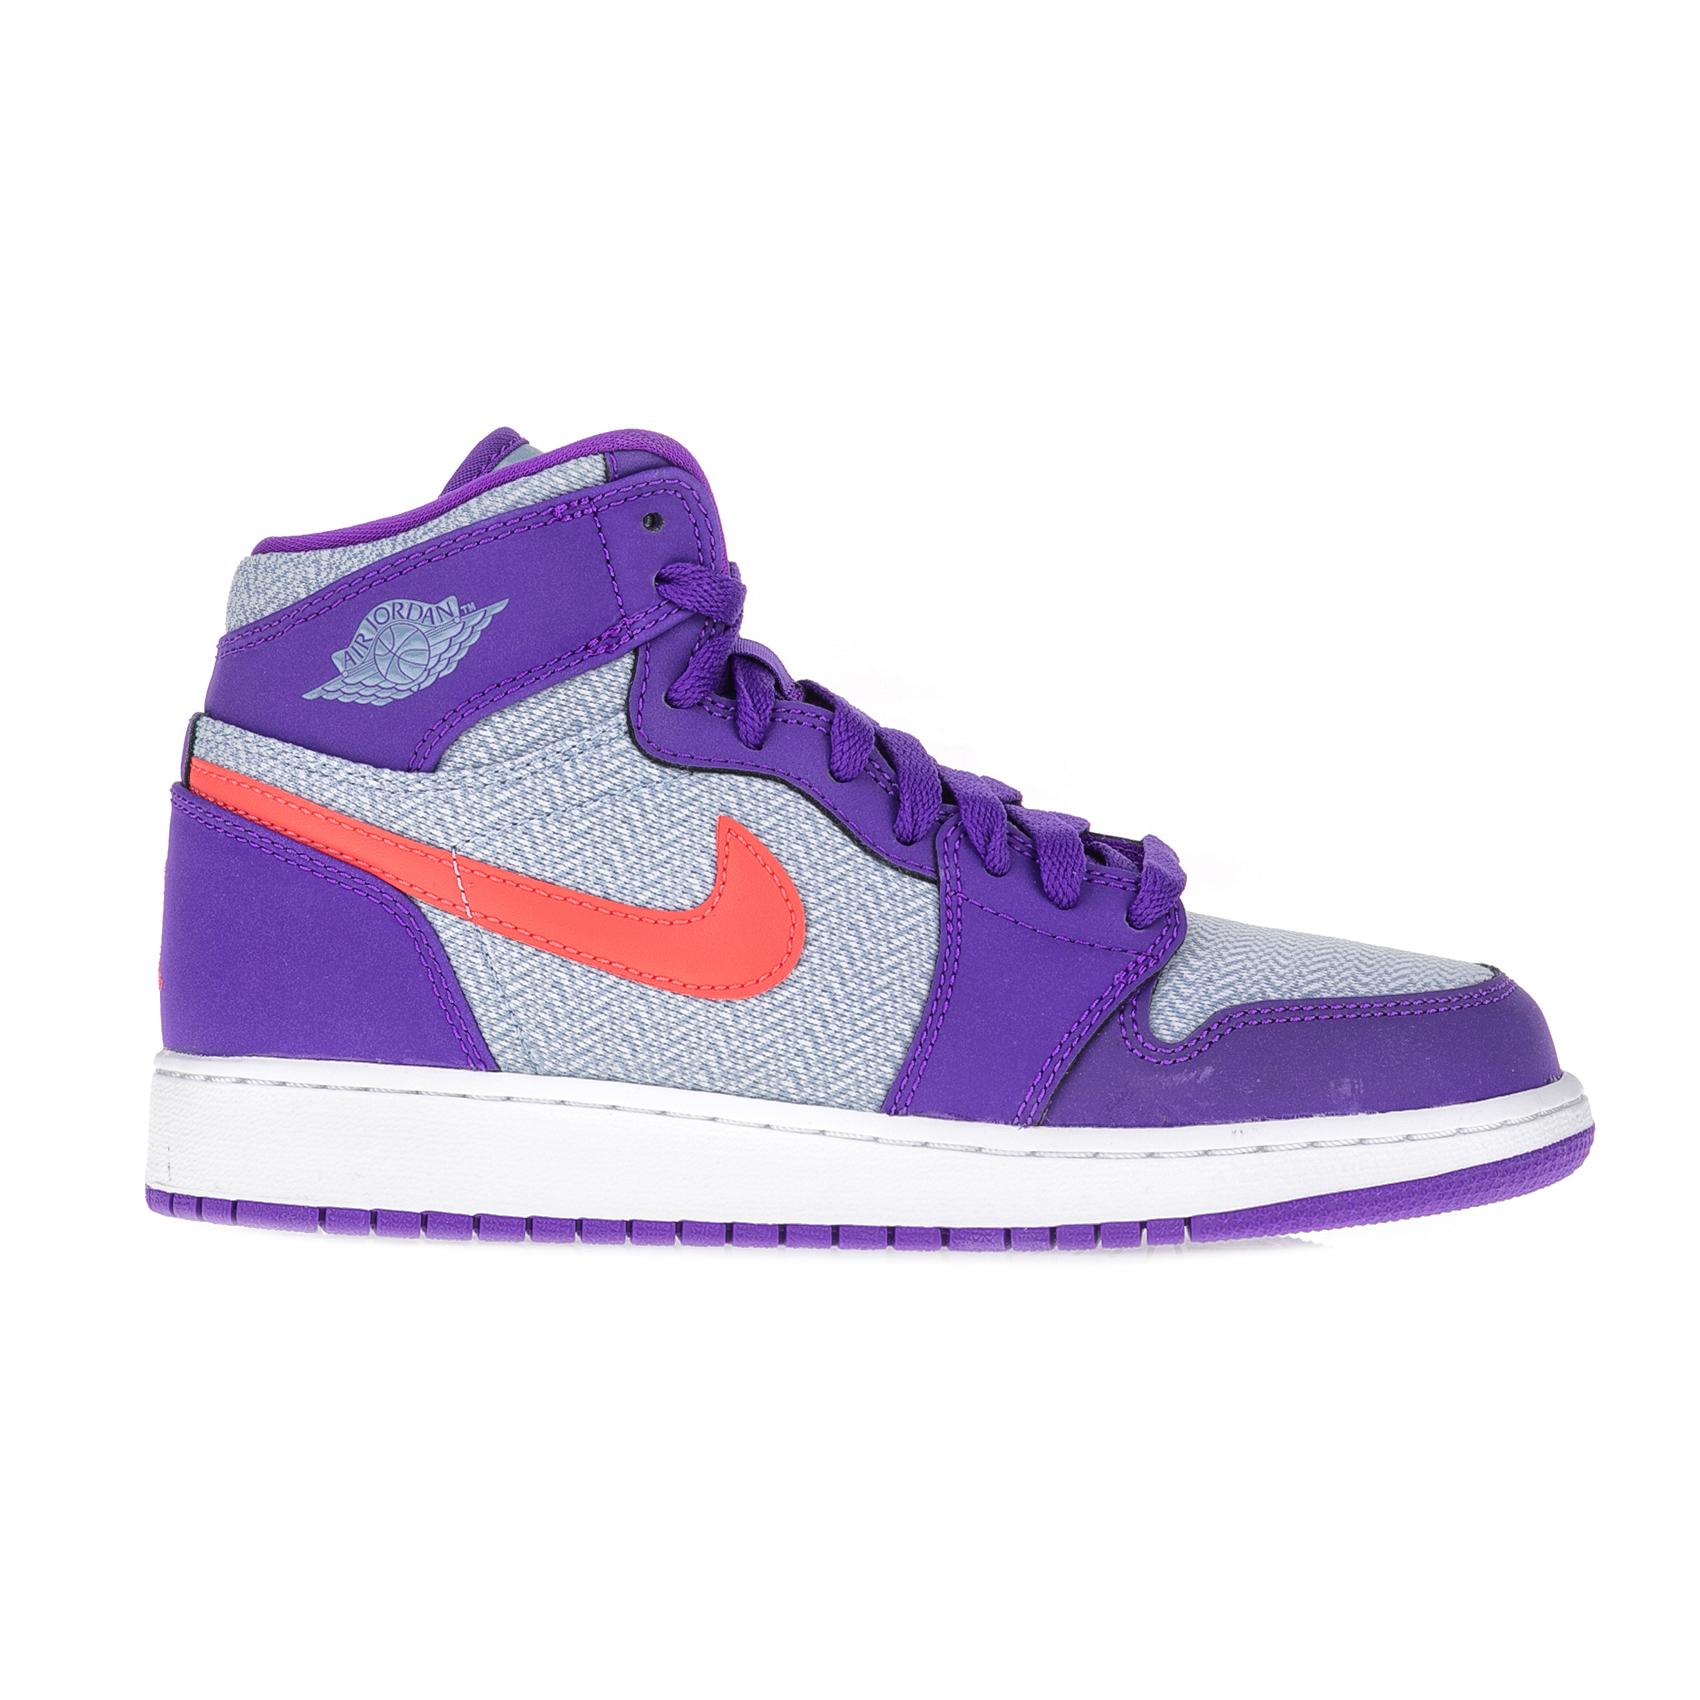 NIKE – Αθλητικά παπούτσια NIKE AIR JORDAN 1 RETRO HIGH GG